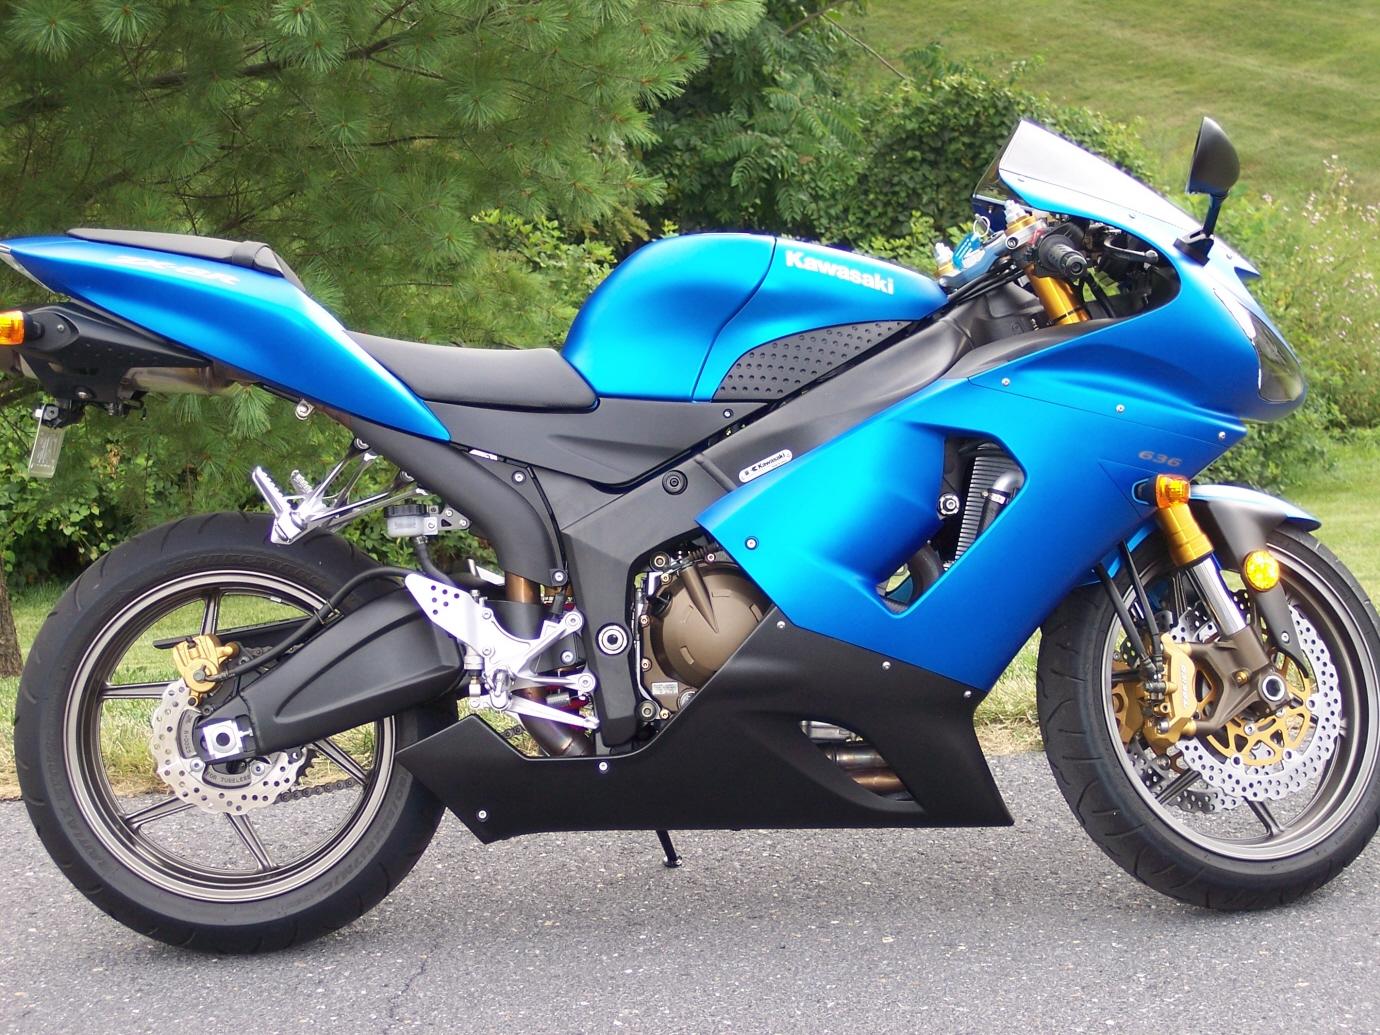 2006 ninja 636 - sportbikes